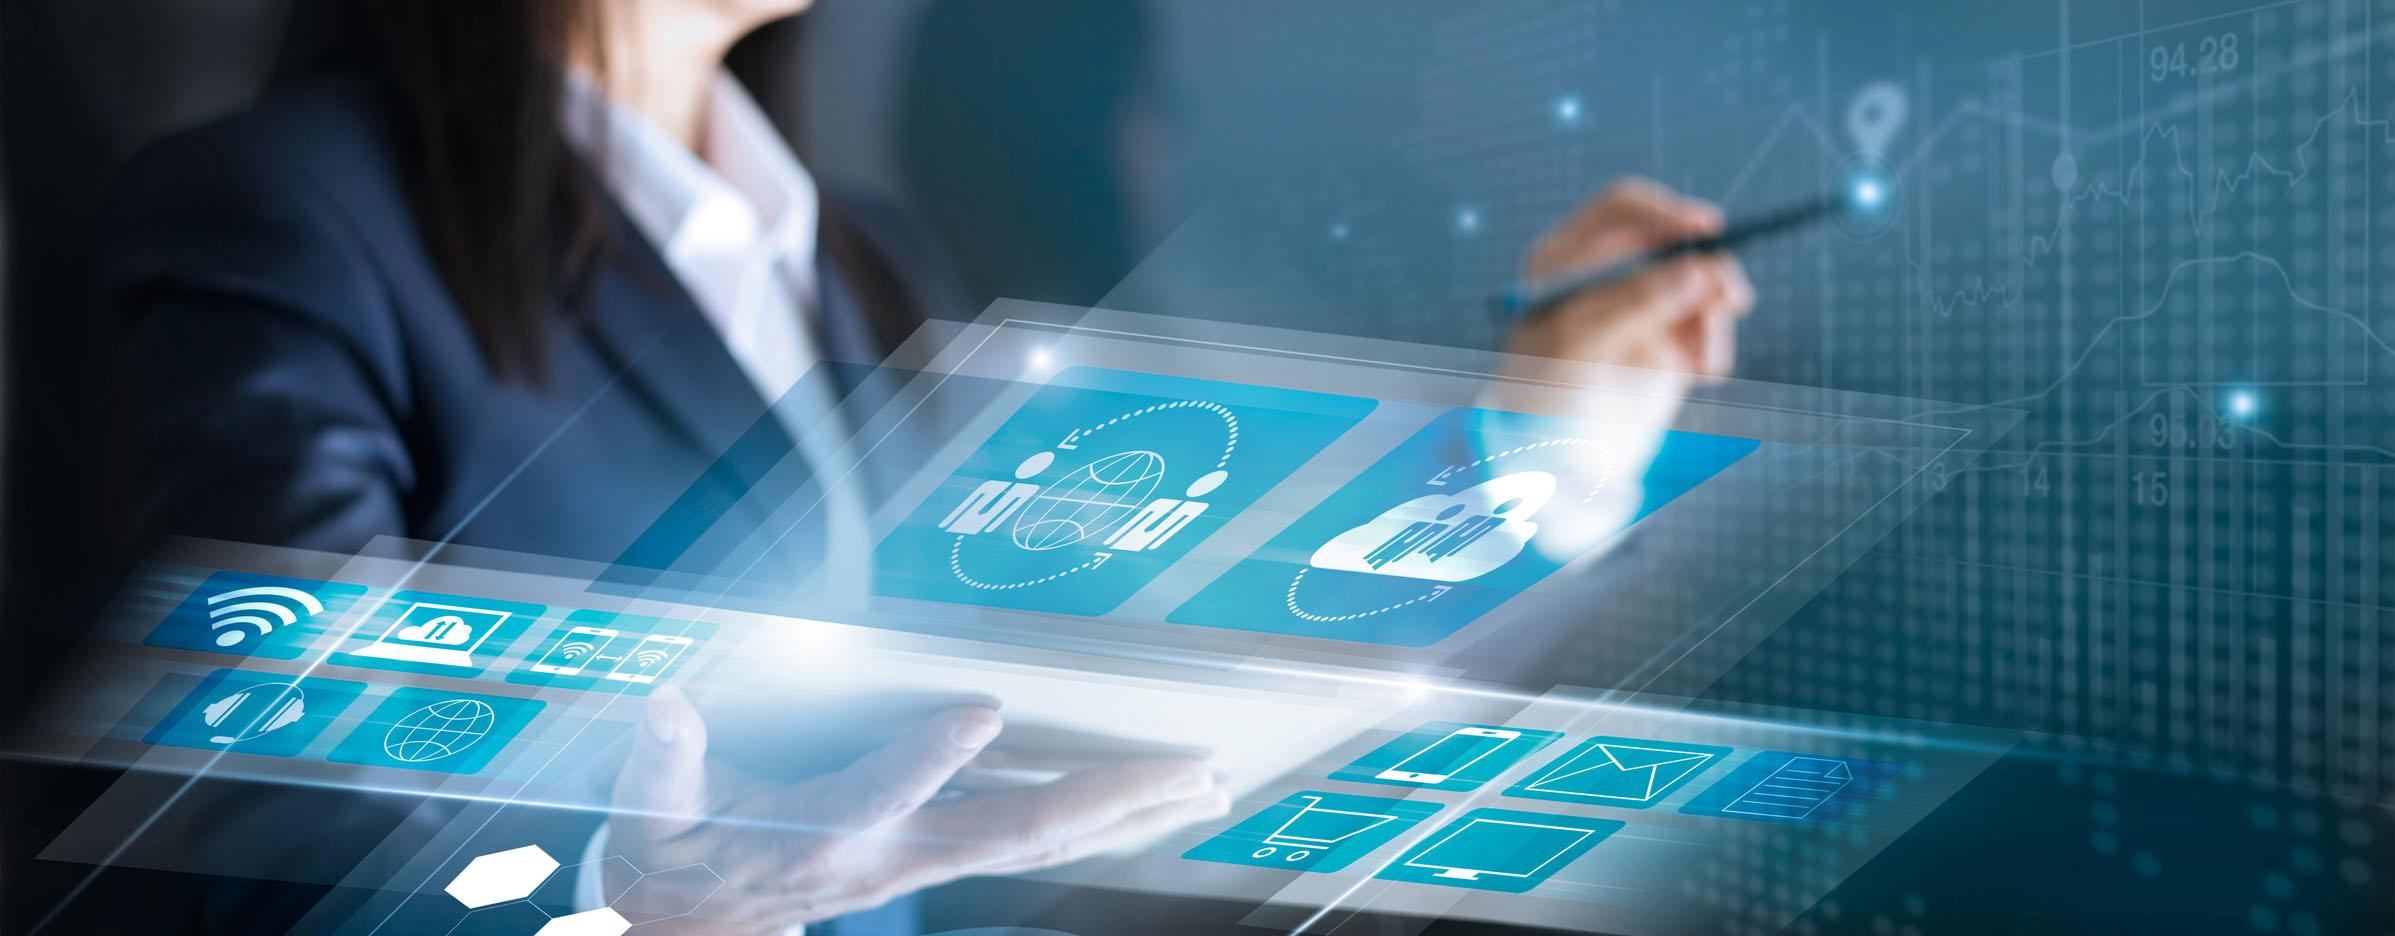 tecnología para innovación empresarial